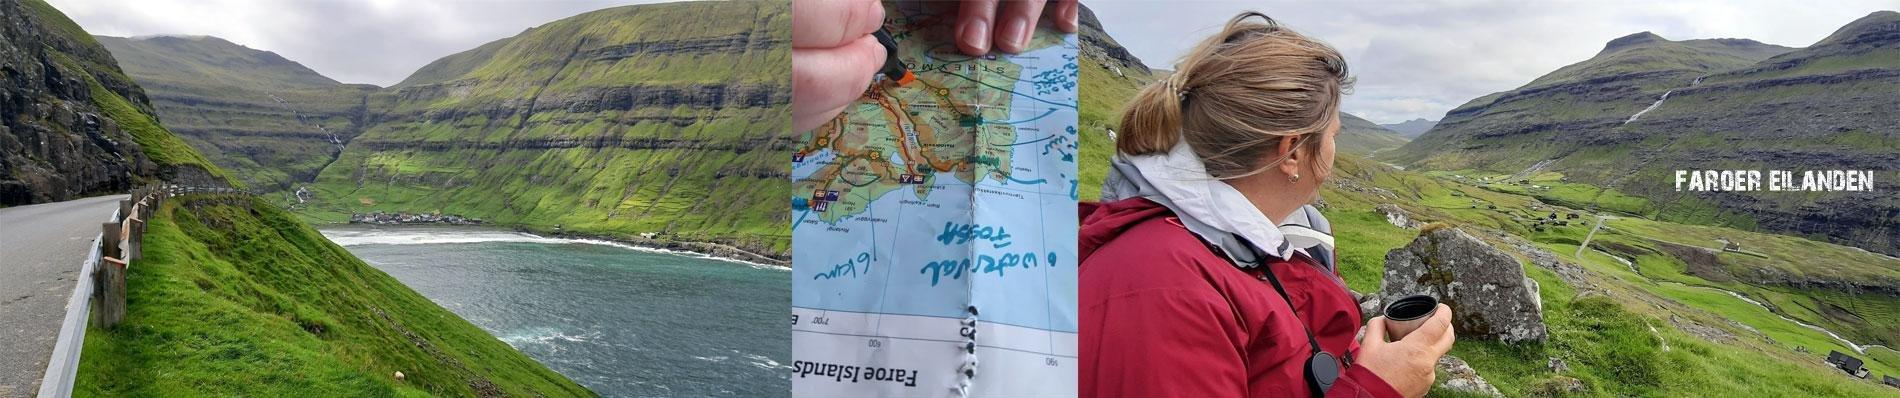 faroer eilanden ijs;land tours